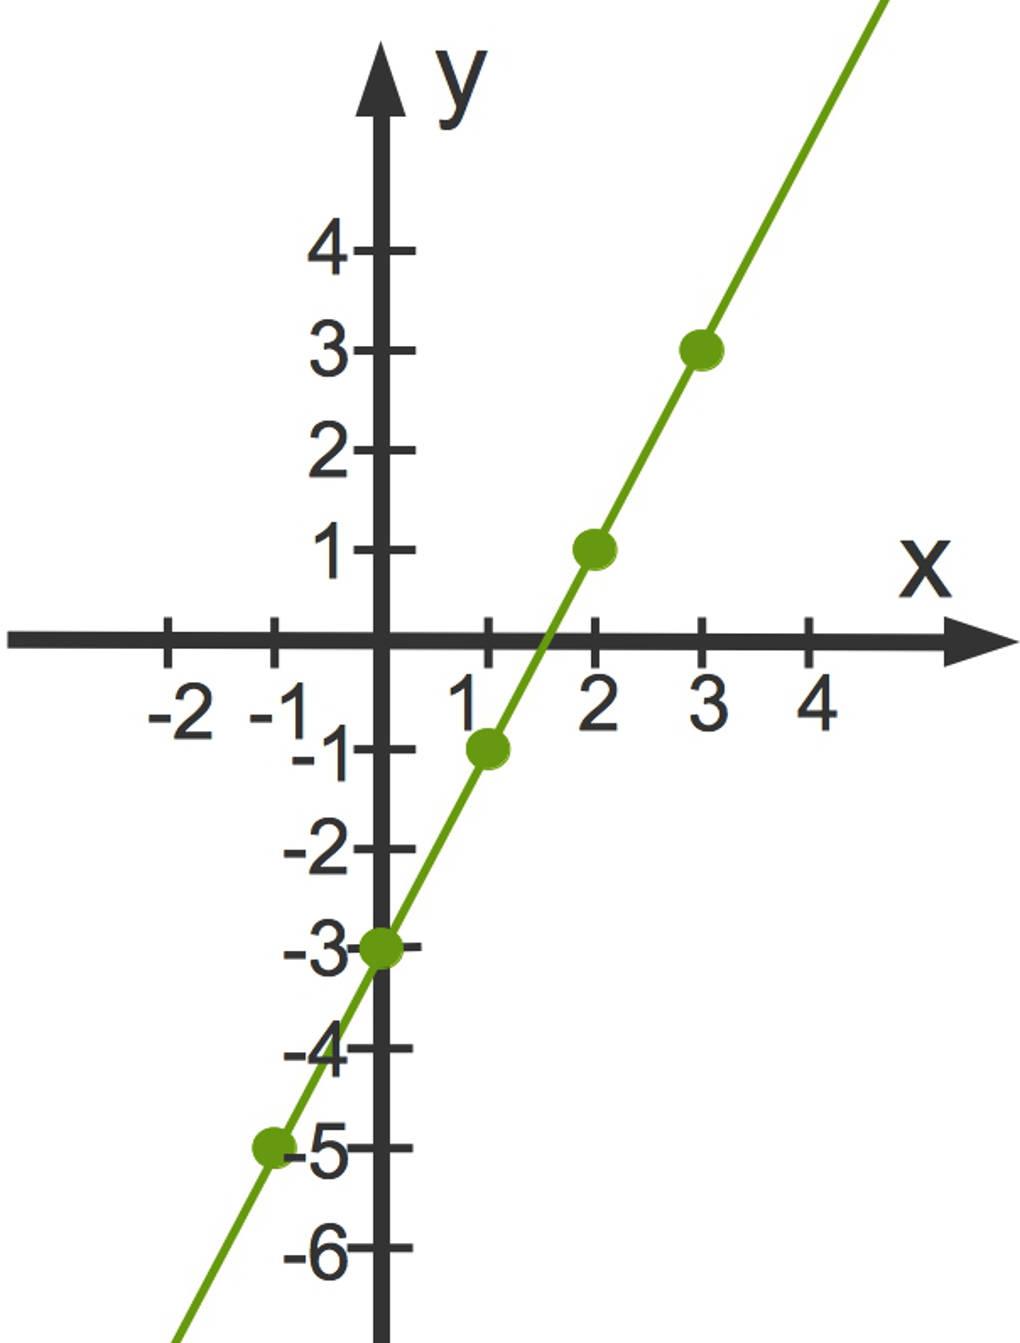 Funktionsgraphen online lernen